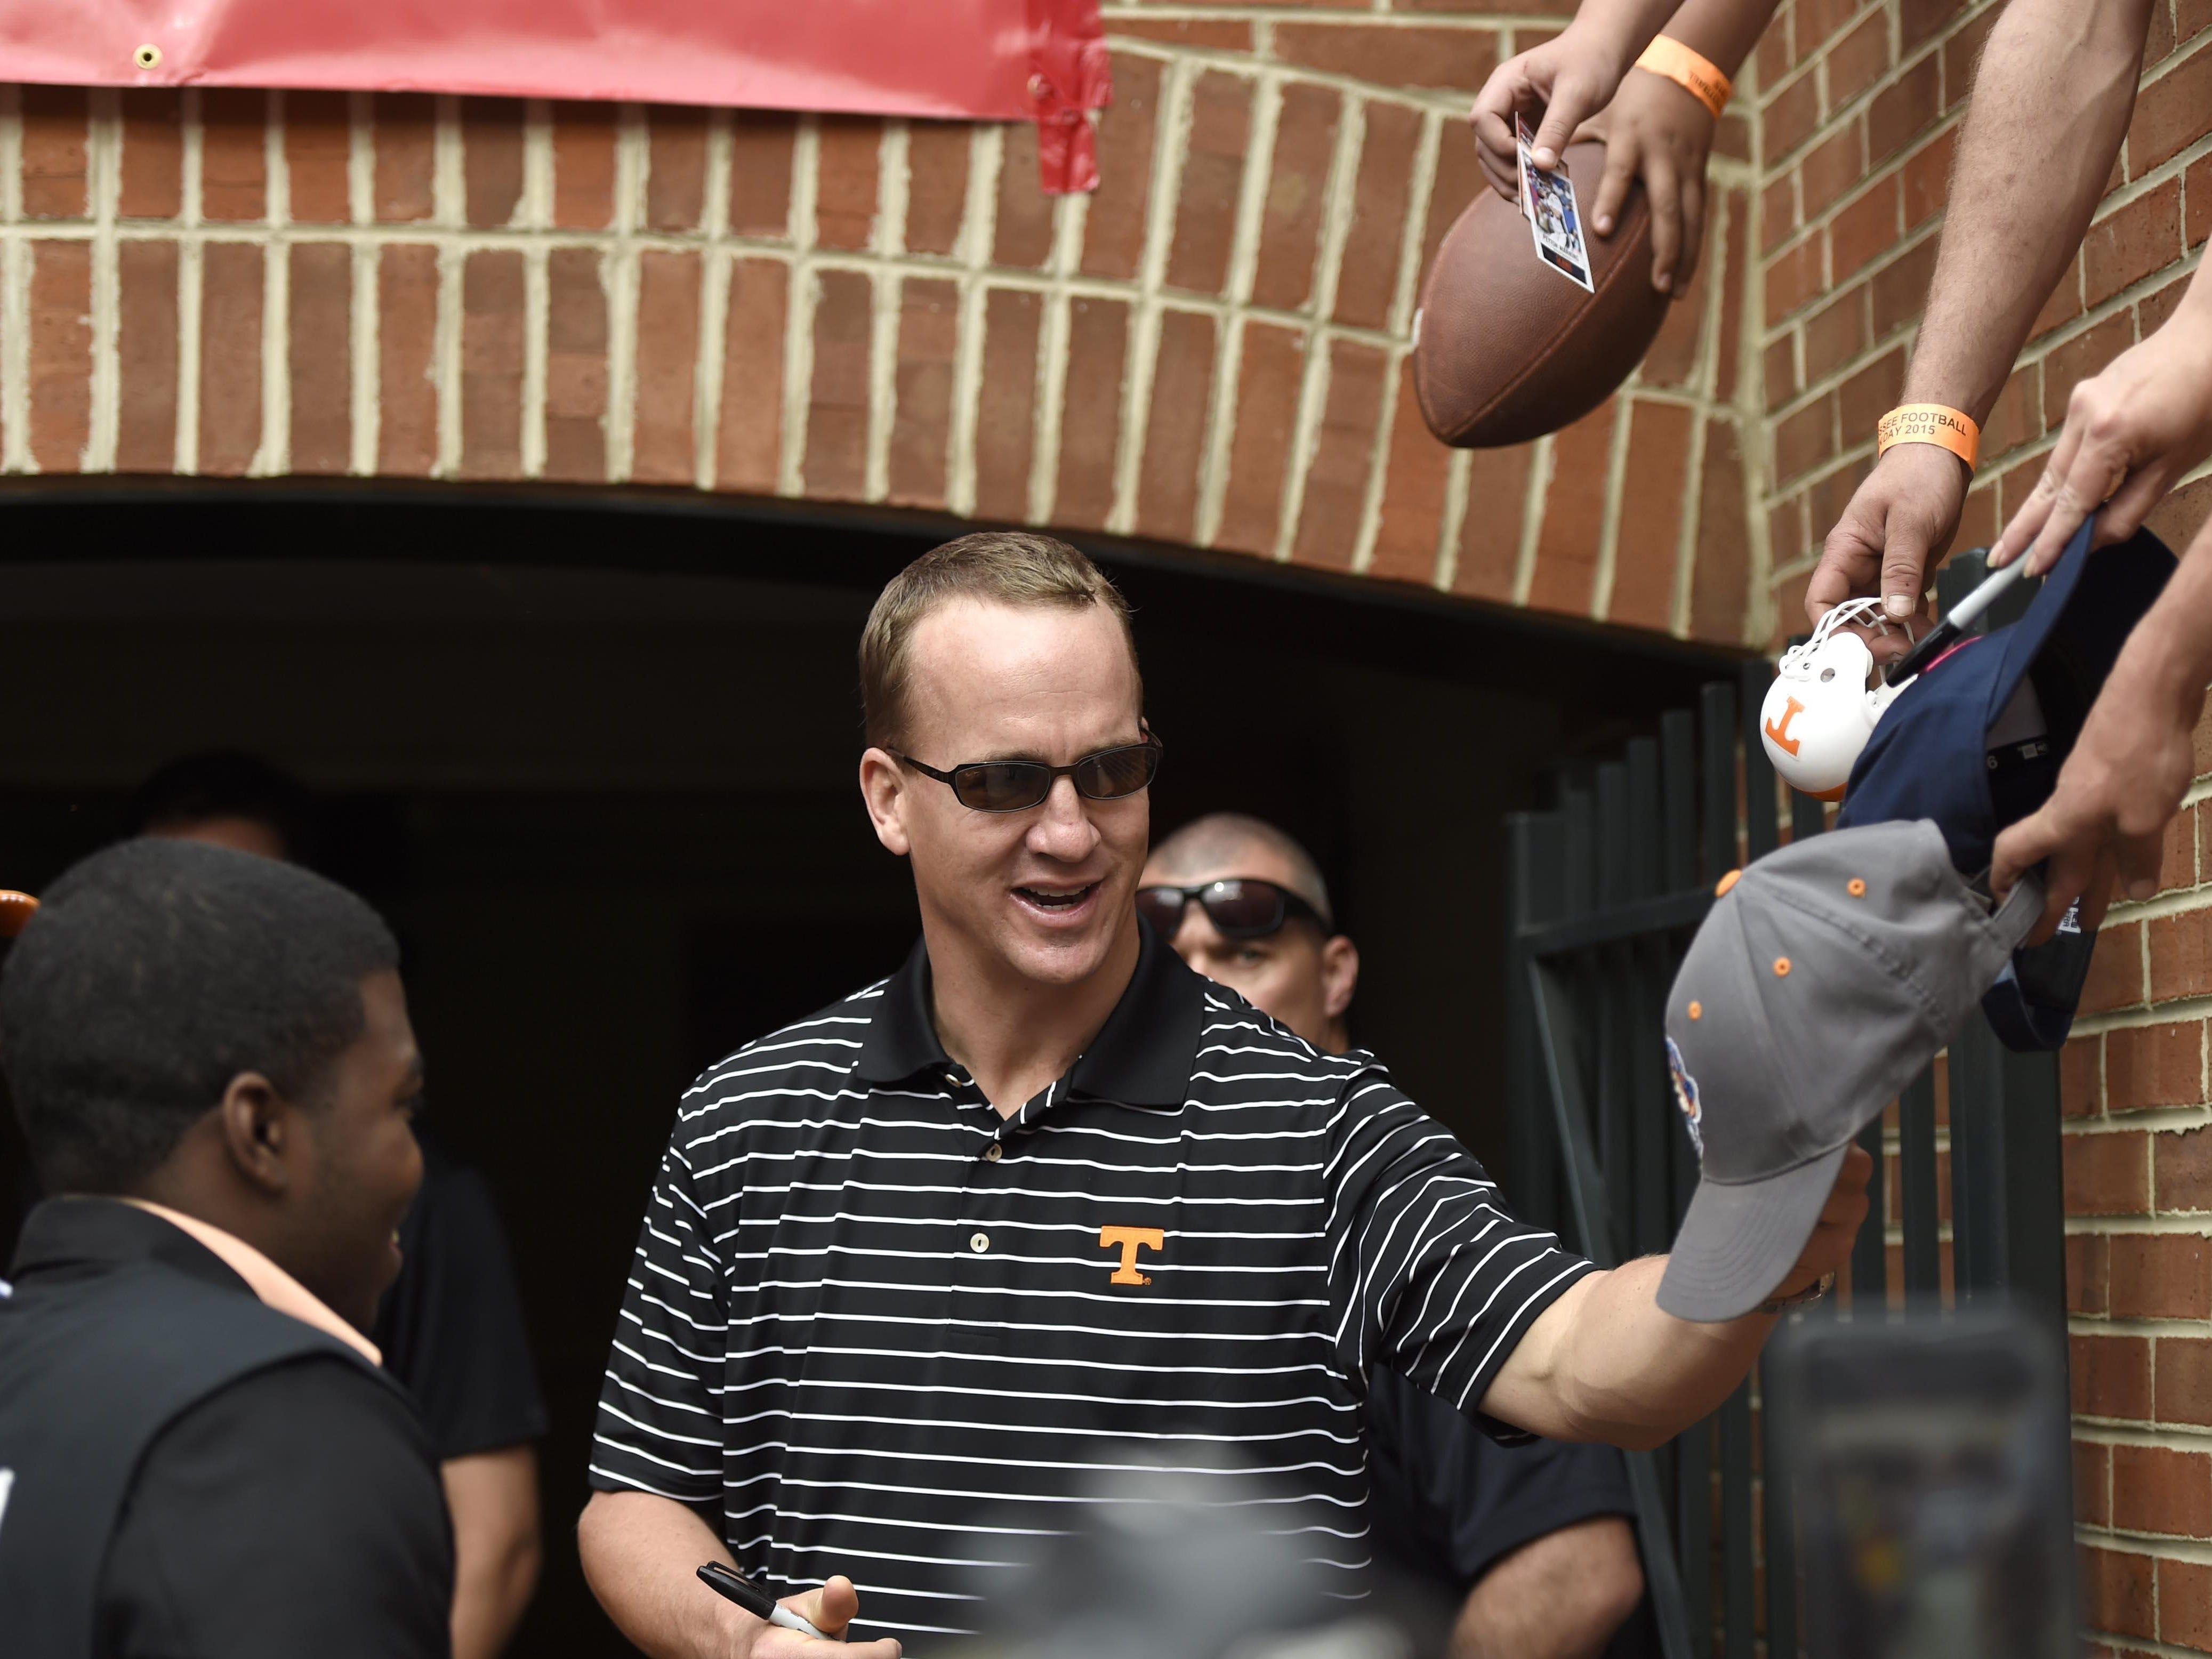 Fans hand memorabilia to former Vols quarterback Peyton Manning for autographs during the Orange & White game at Neyland Stadium in April.